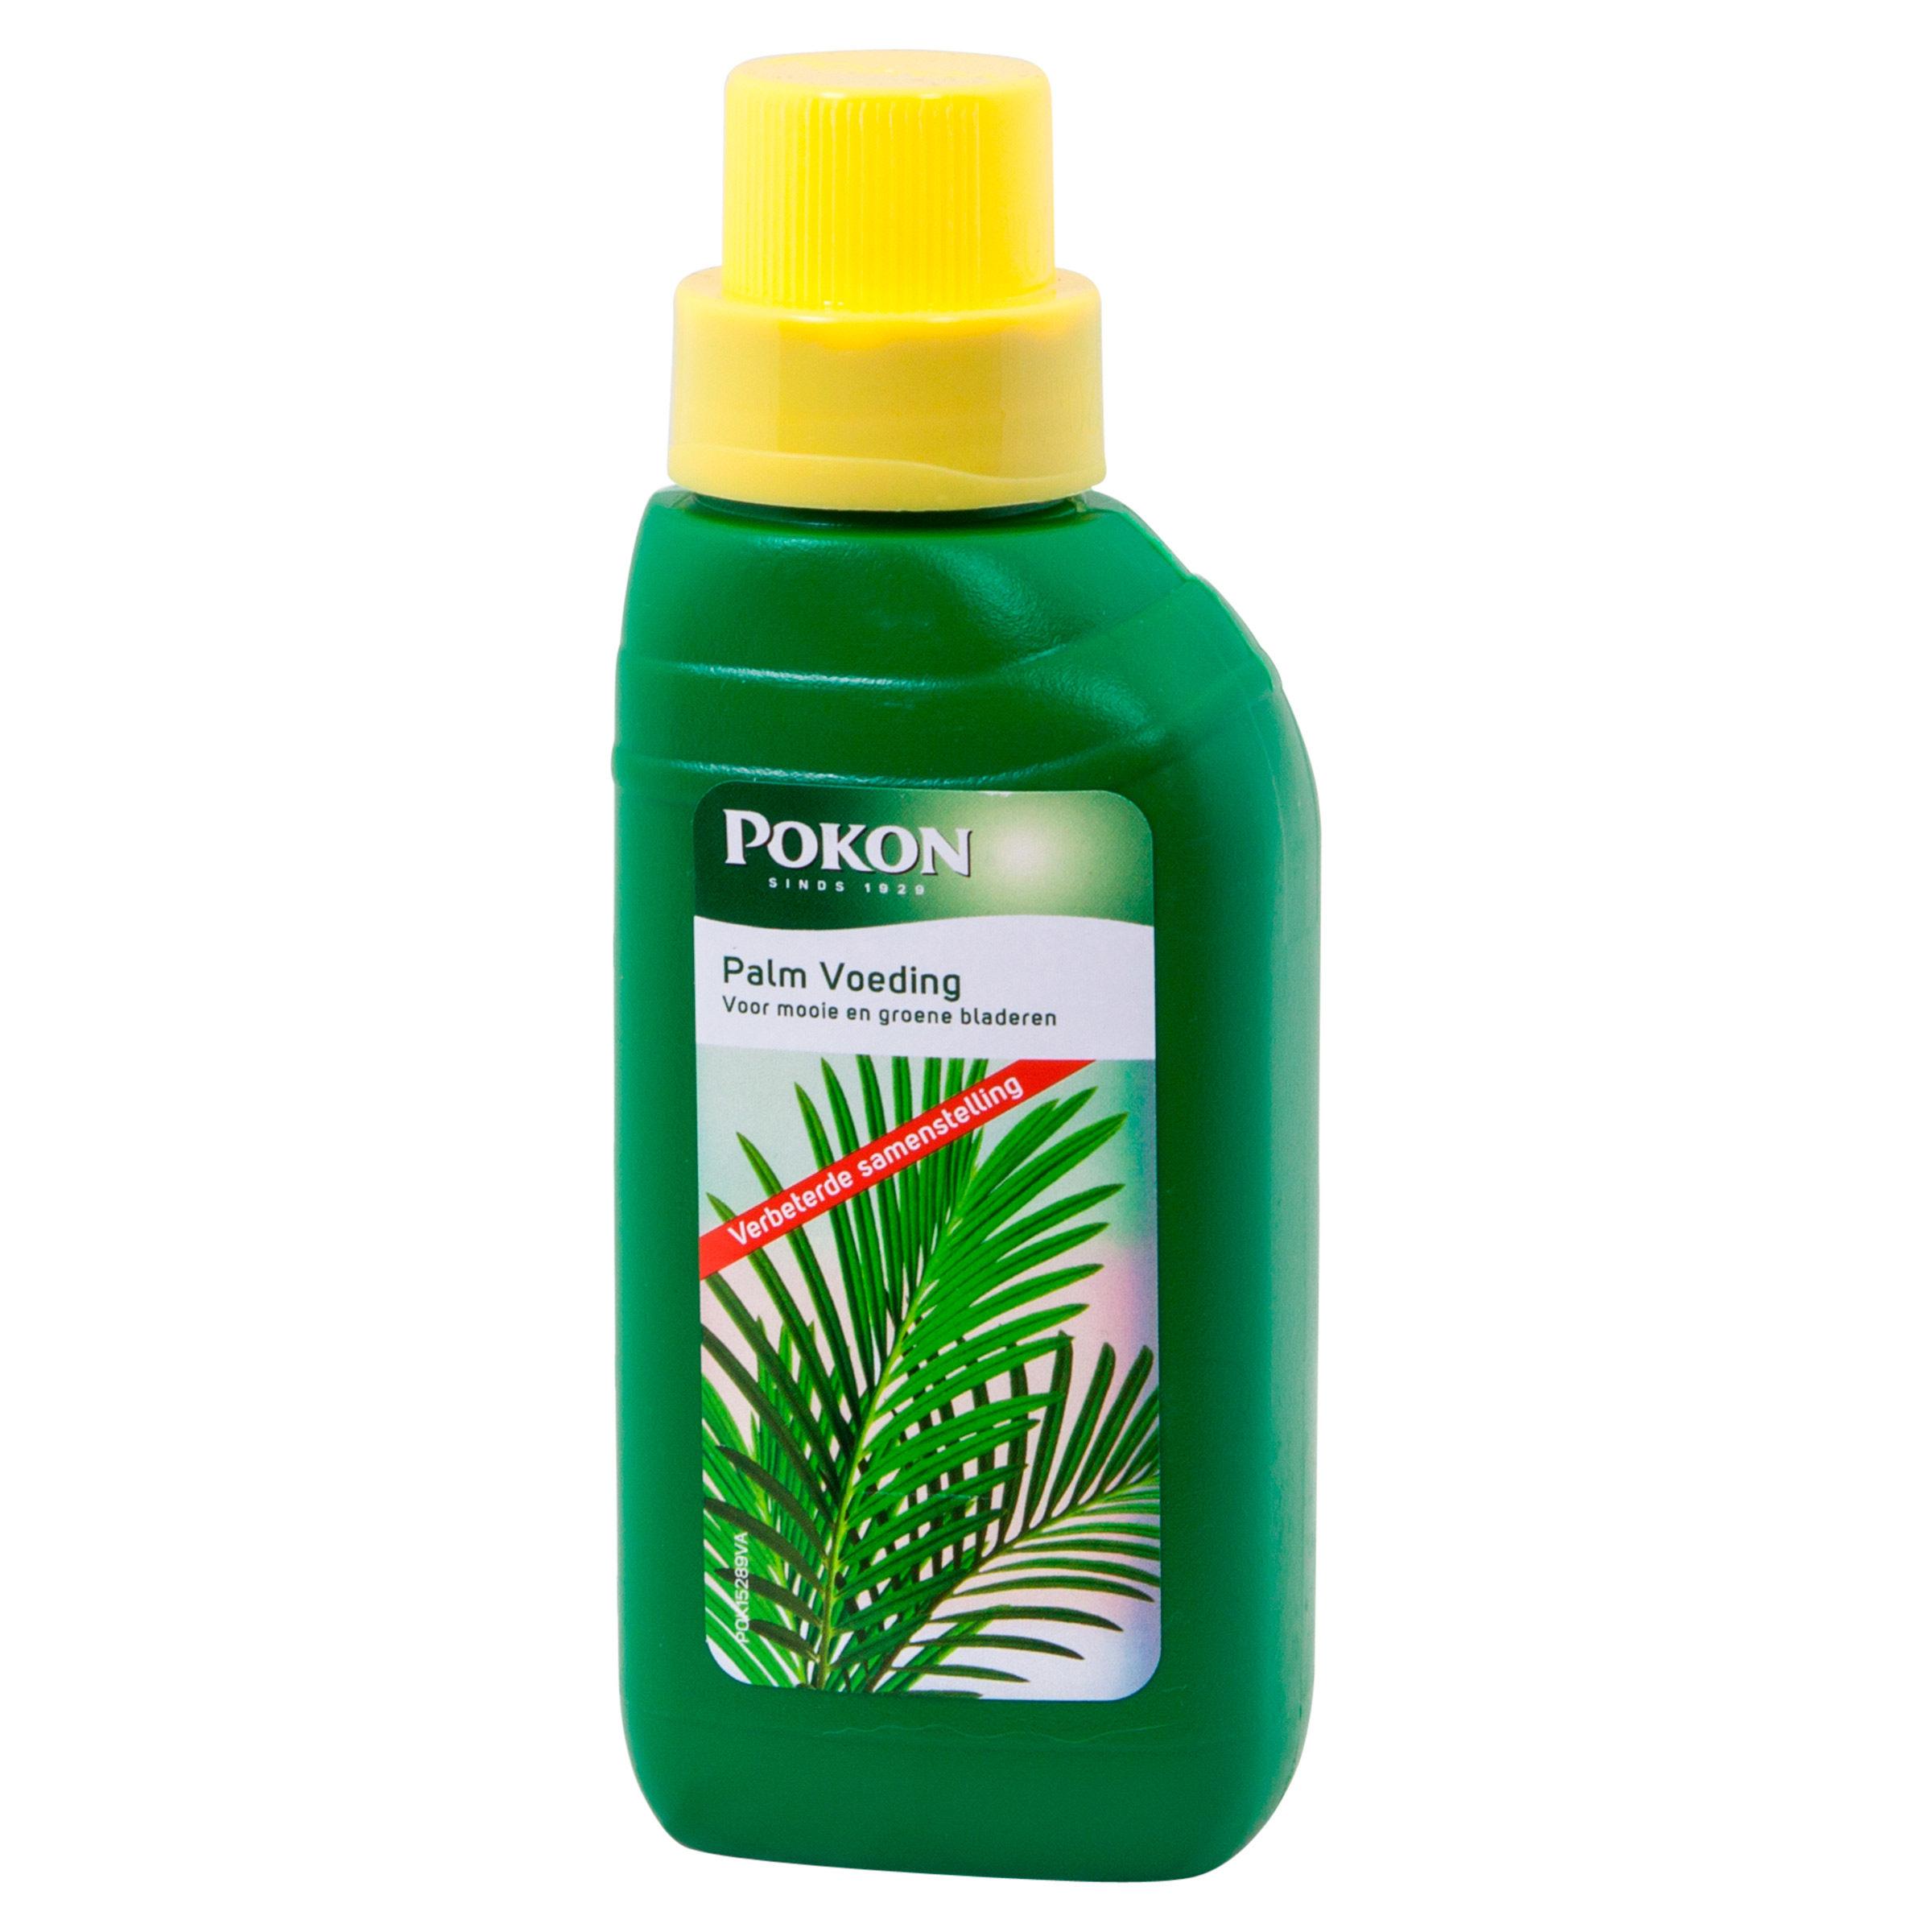 Pokon Palm Voeding 250ml rechts